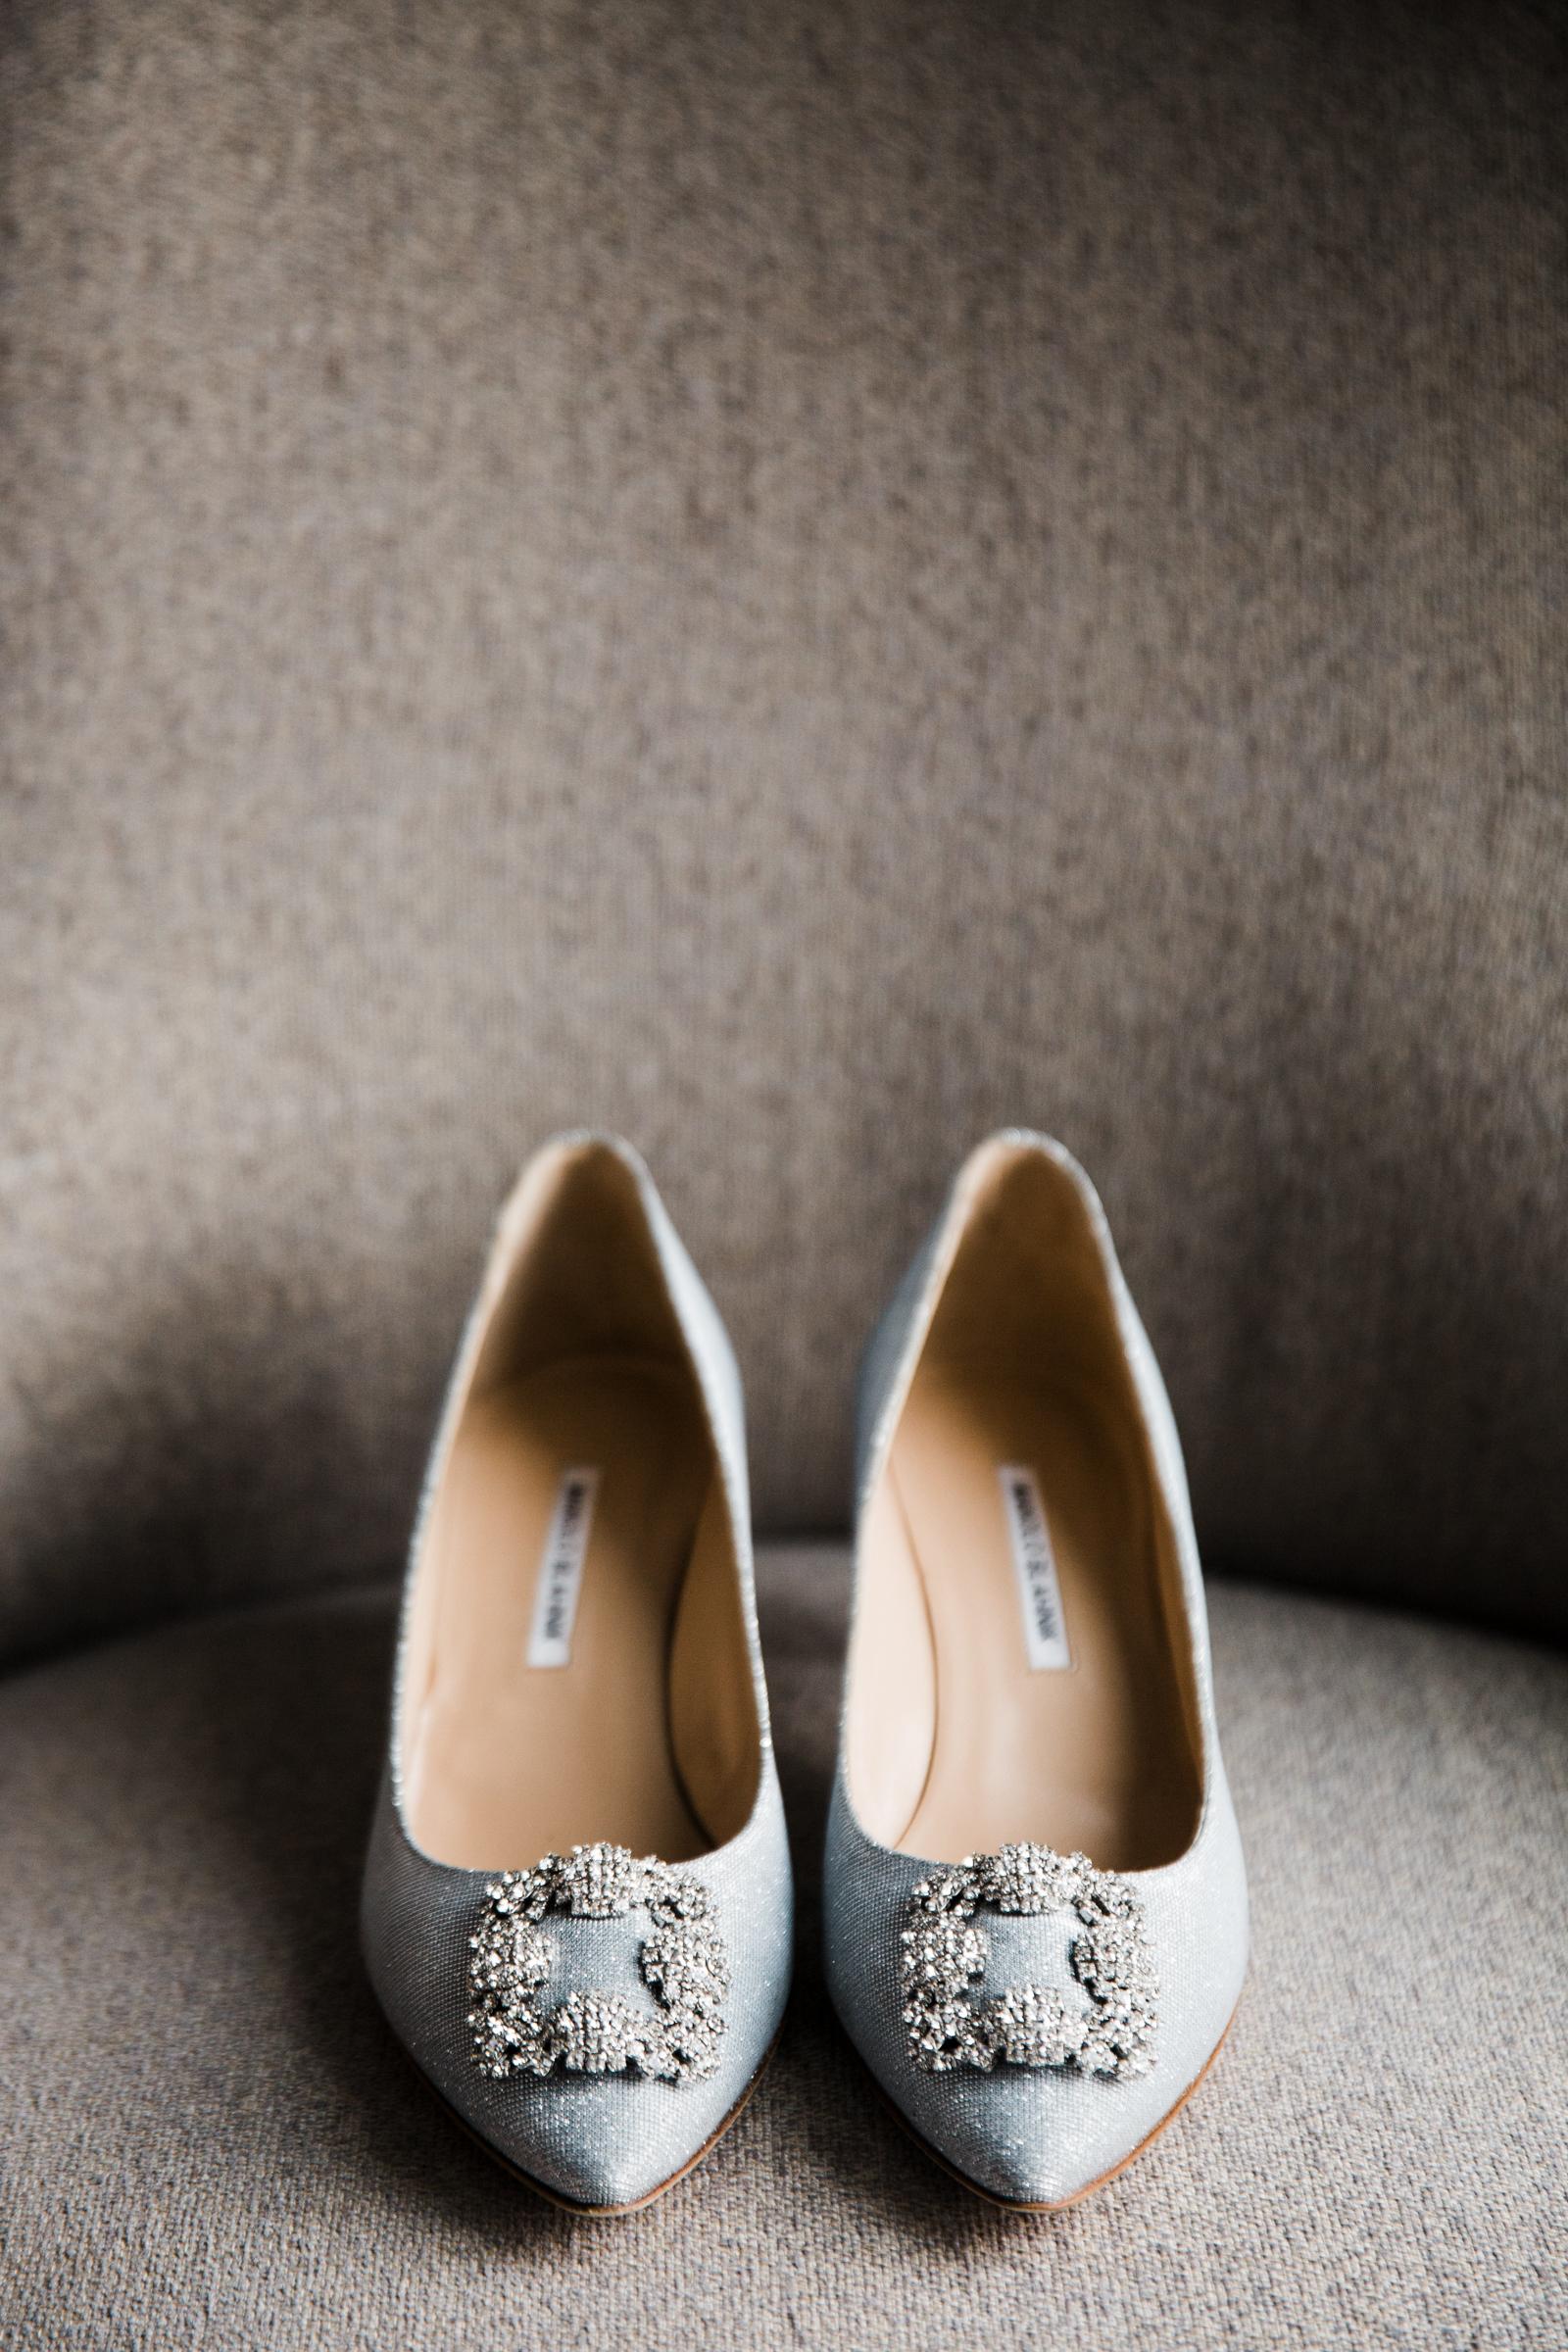 Soft blue wedding shoes with square rhinestone design - photo by Stephanie Cristalli Photography